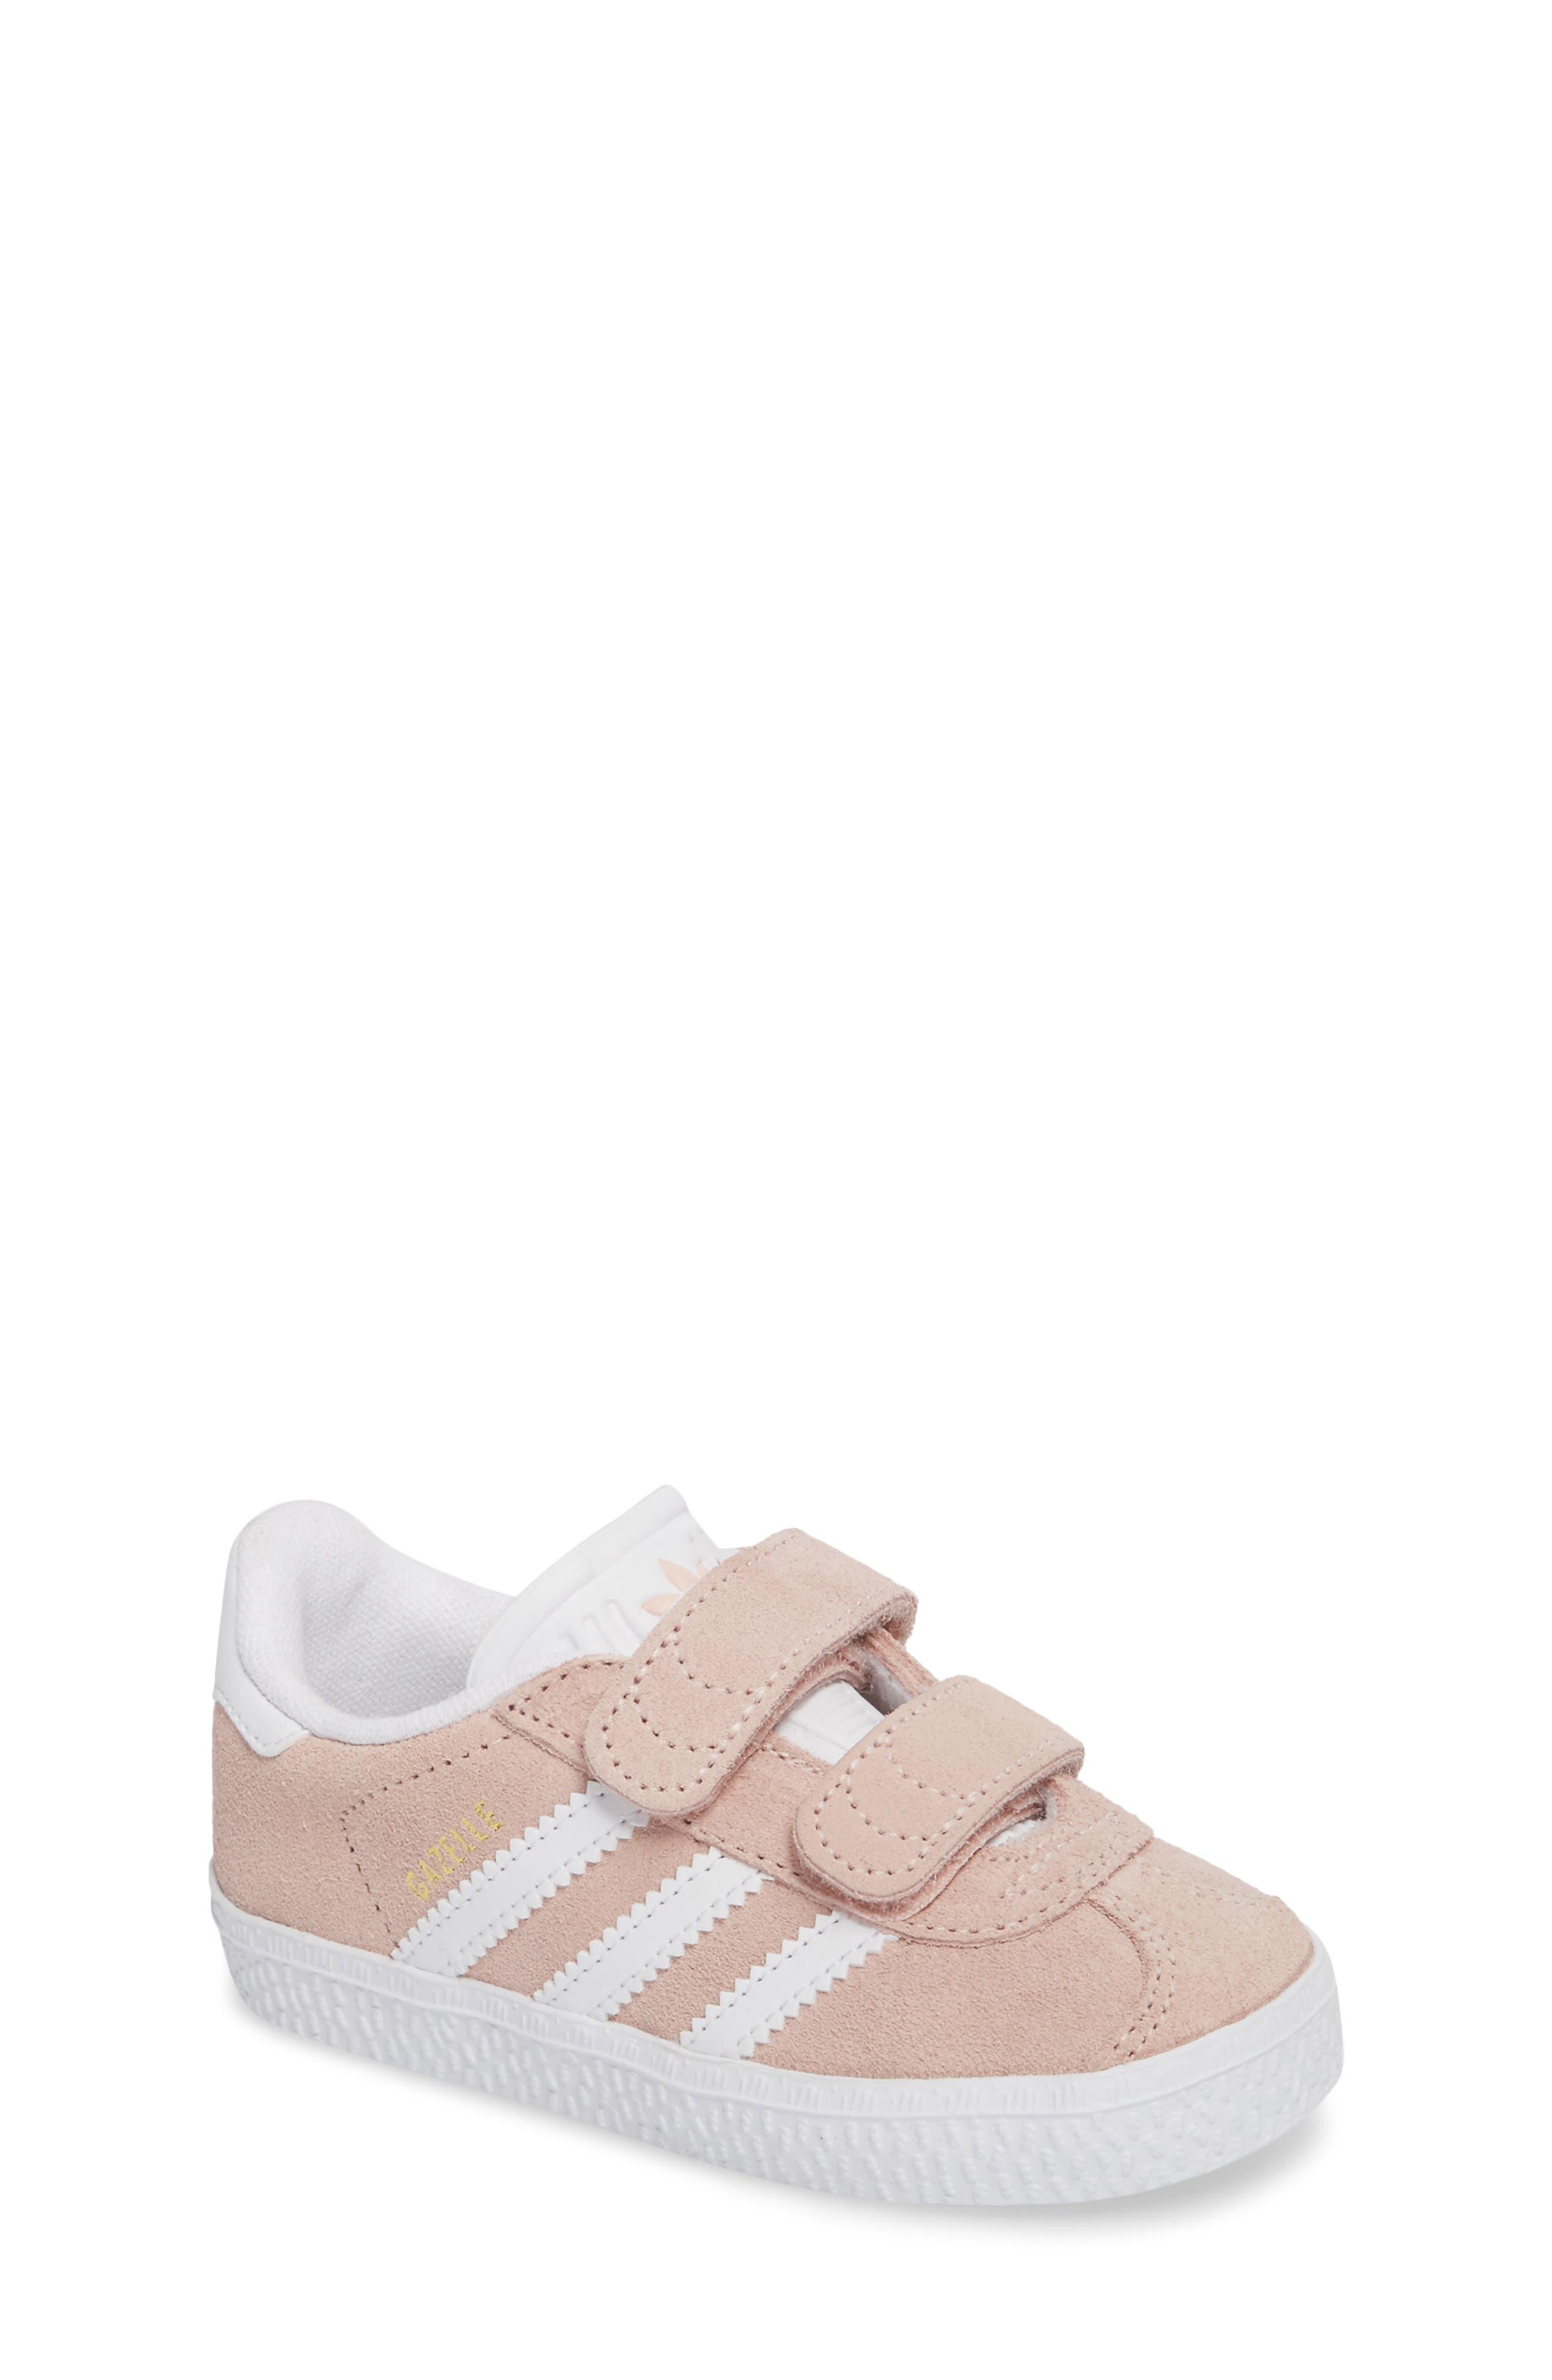 Gazelle Sneaker,                             Main thumbnail 1, color,                             Icey Pink / White / White